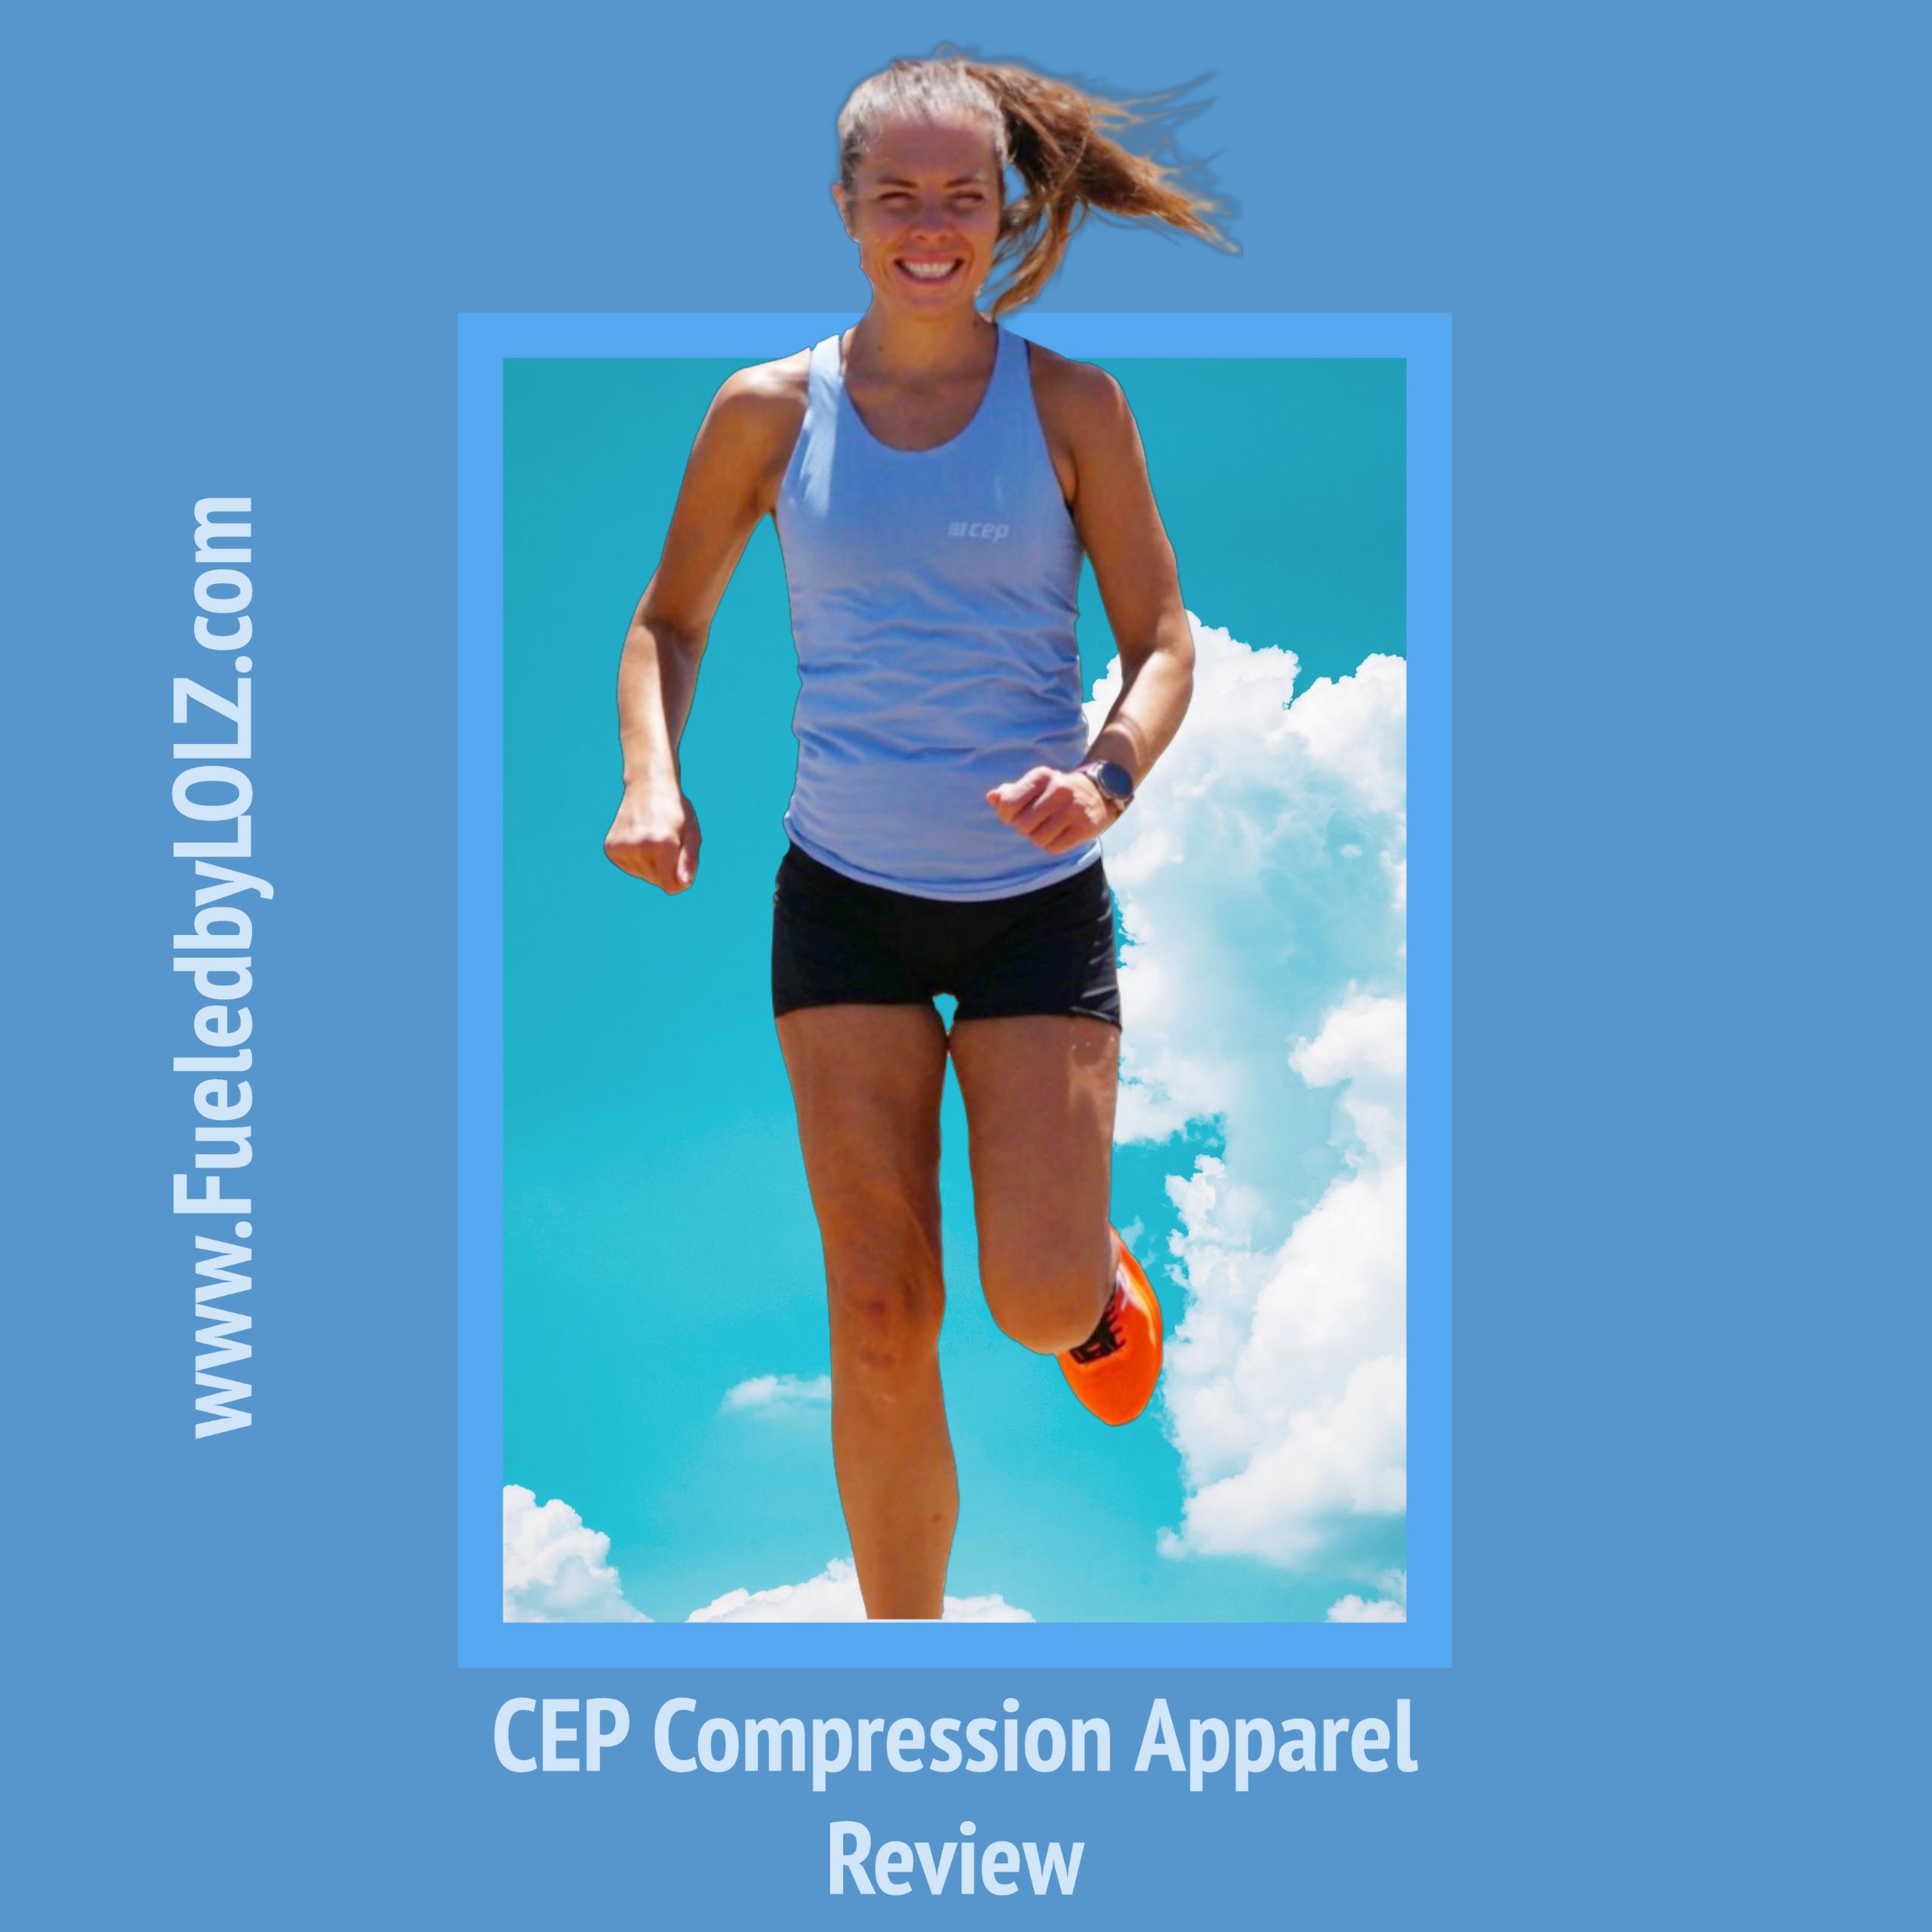 CEP Compression Apparel Review